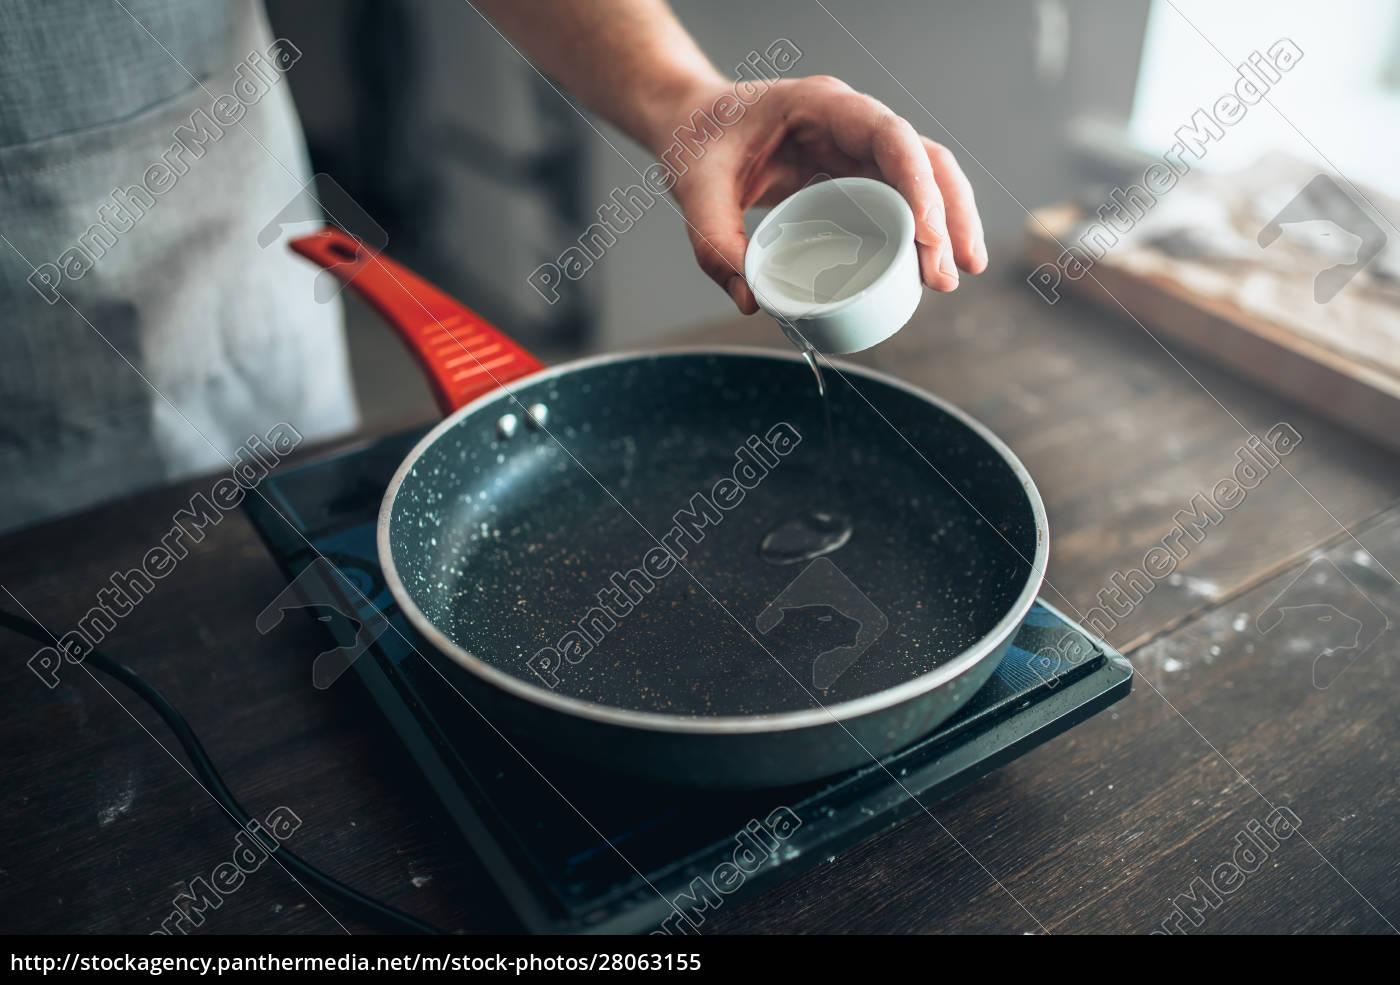 male, person, hands, pour, oil, in - 28063155